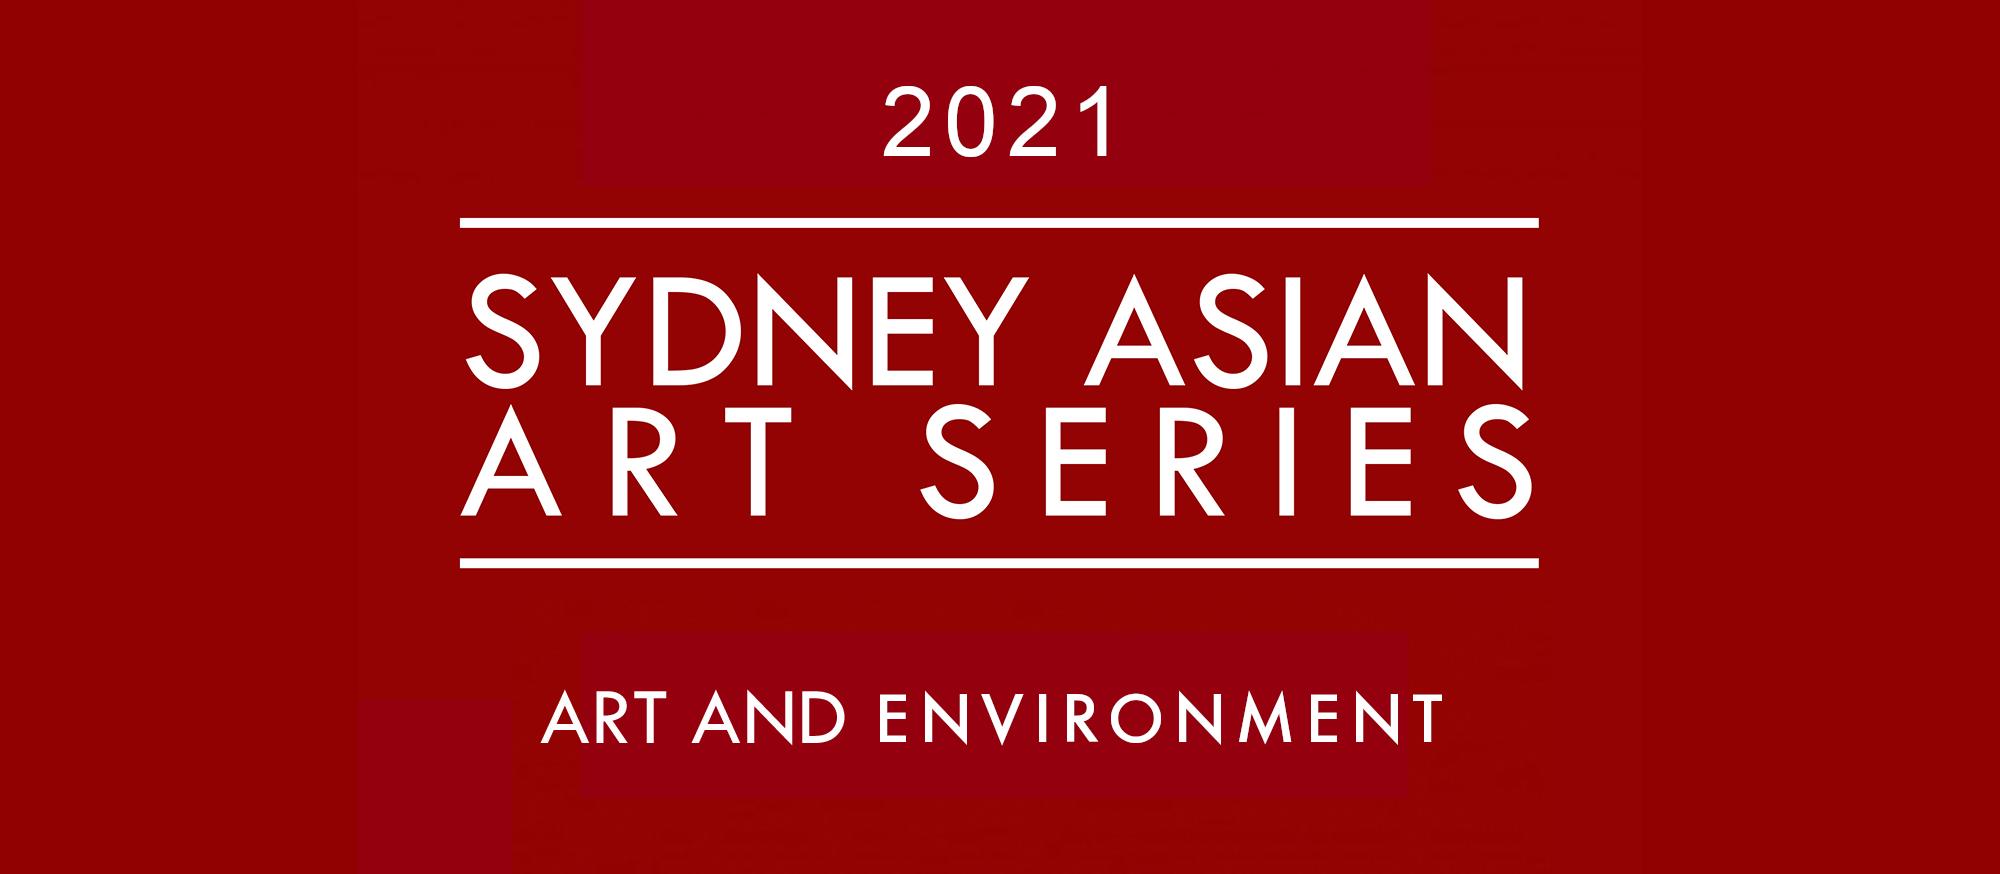 Sydney Asian Art Series 2021